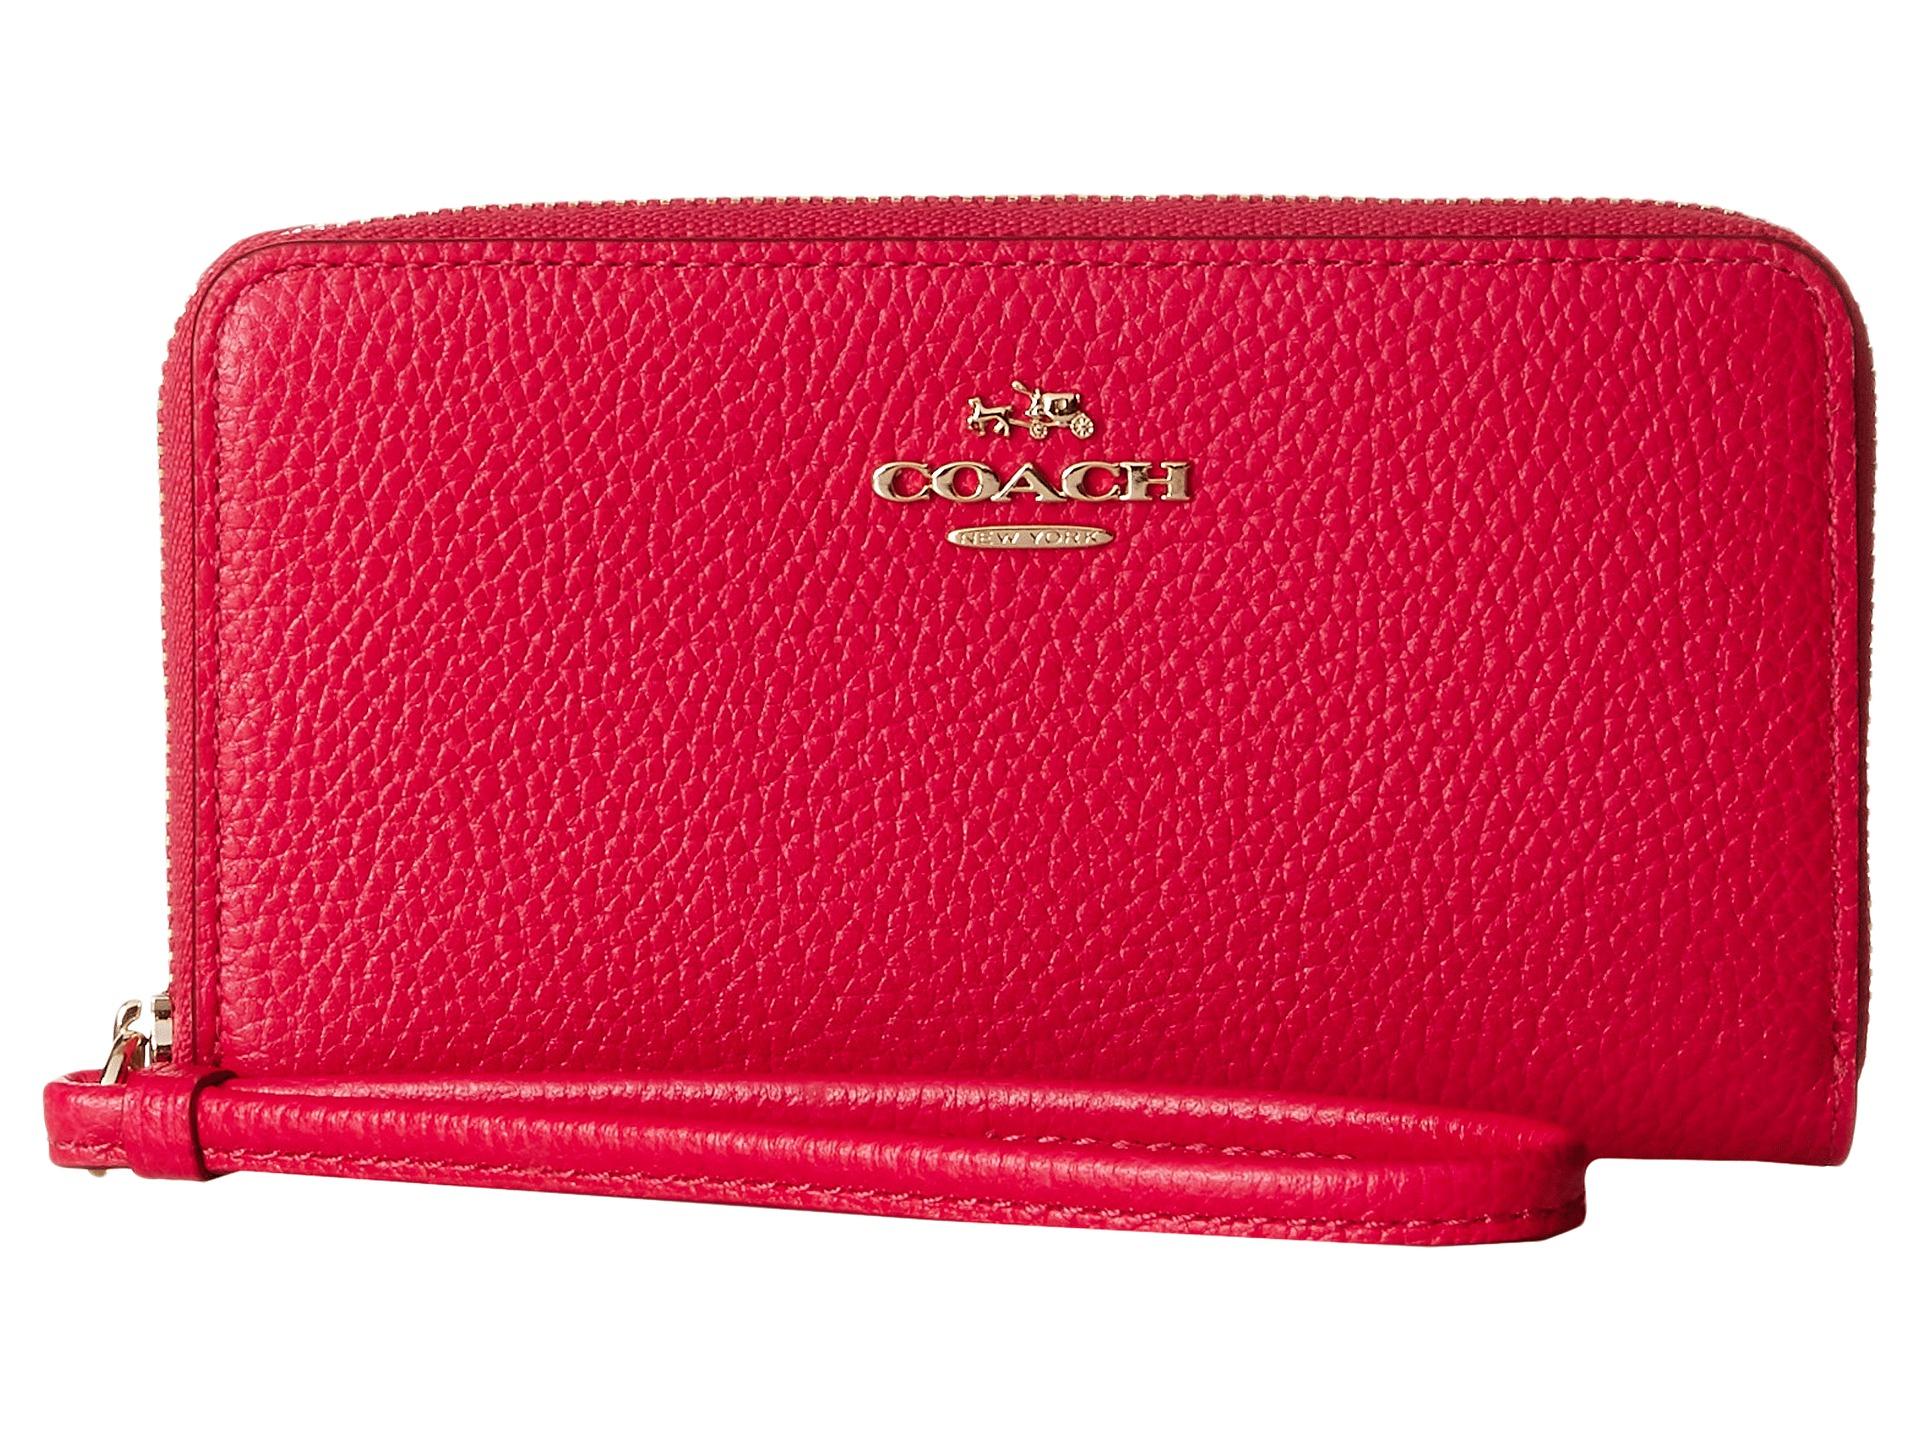 9d3efdc596ab Lyst - Coach Box Progam Polished Pebble Zip Case in Pink